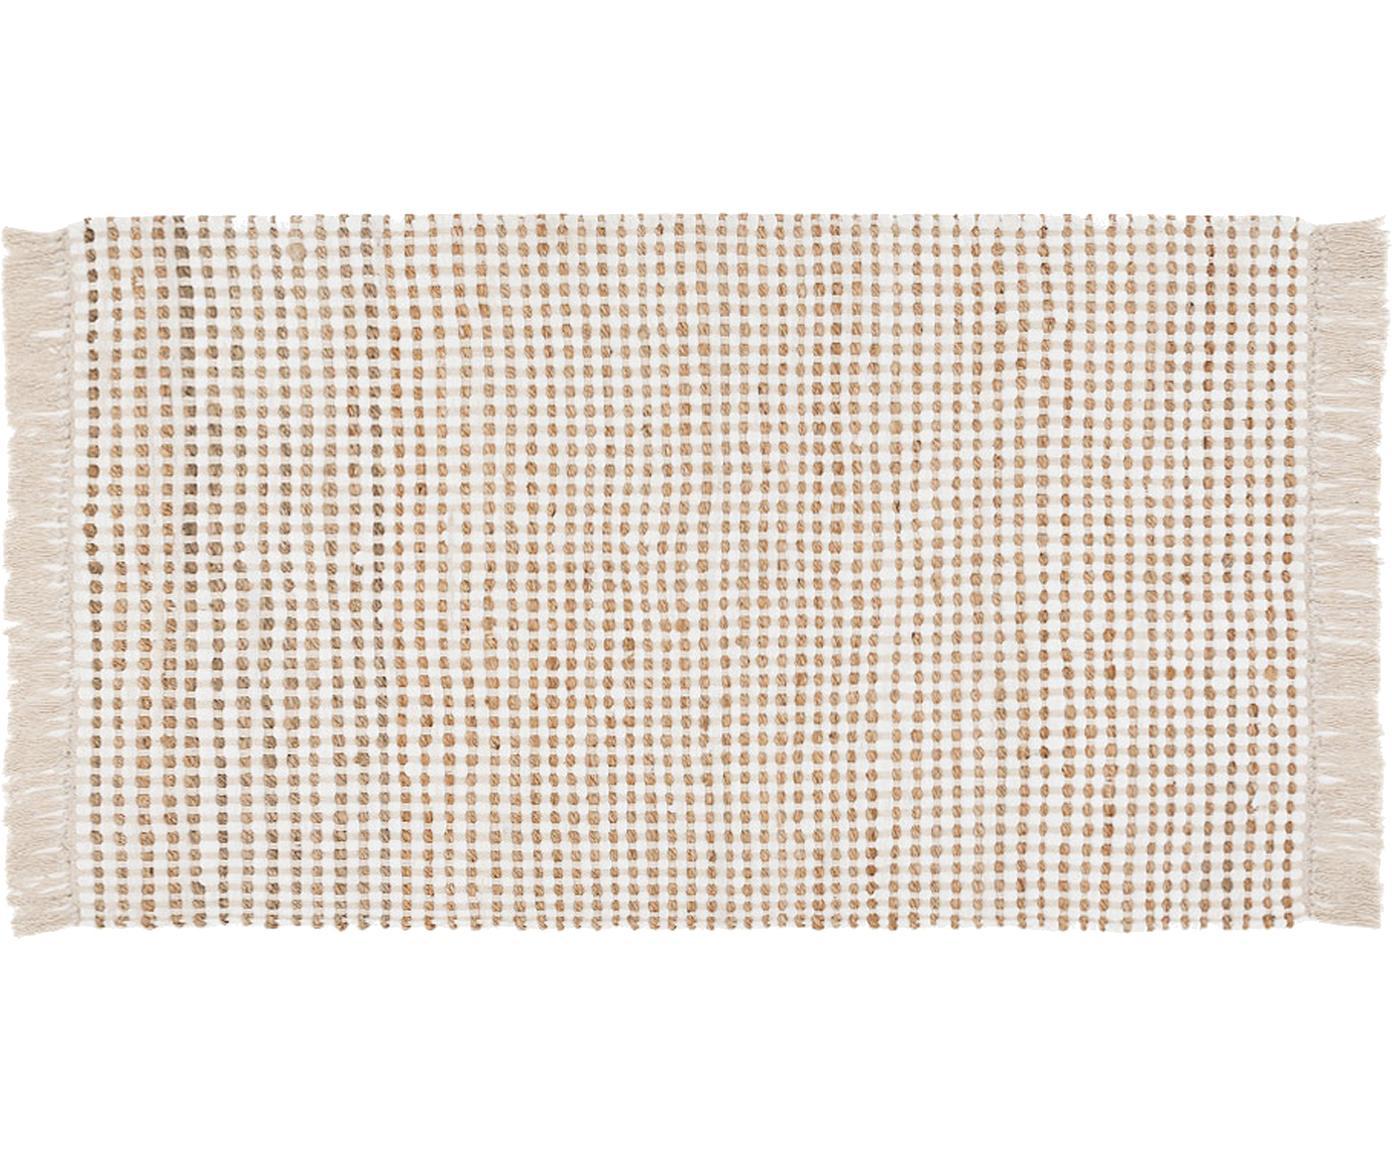 Alfombra de algodón/yute Fiesta, 55%algodón, 45%yute, Blanco, beige, An 90 x L 150 cm (Tamaño XS)